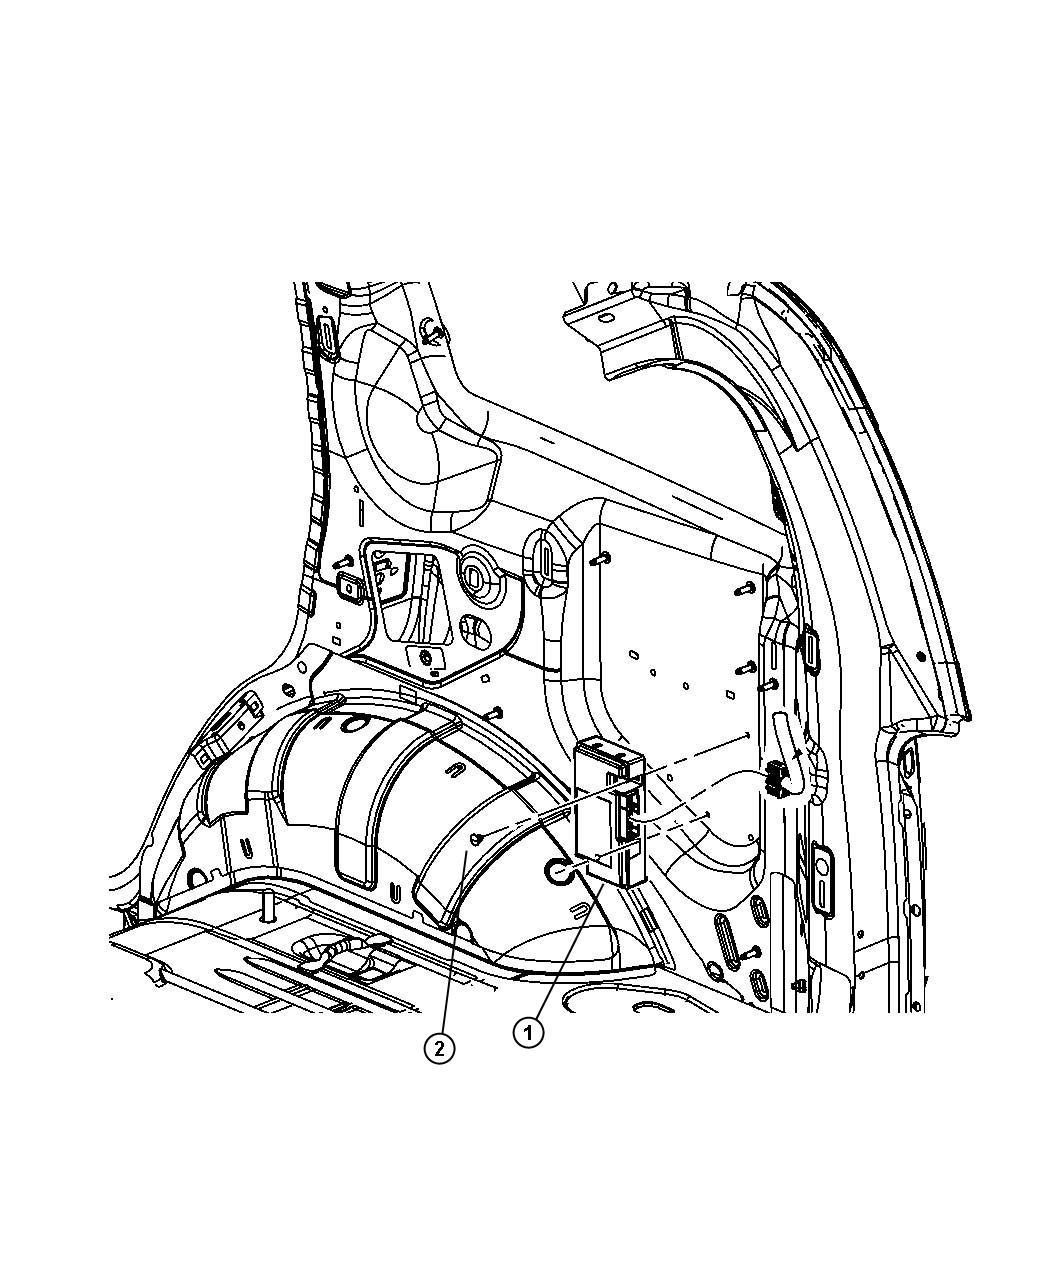 Chrysler PT Cruiser Module. Telematics. With attaching